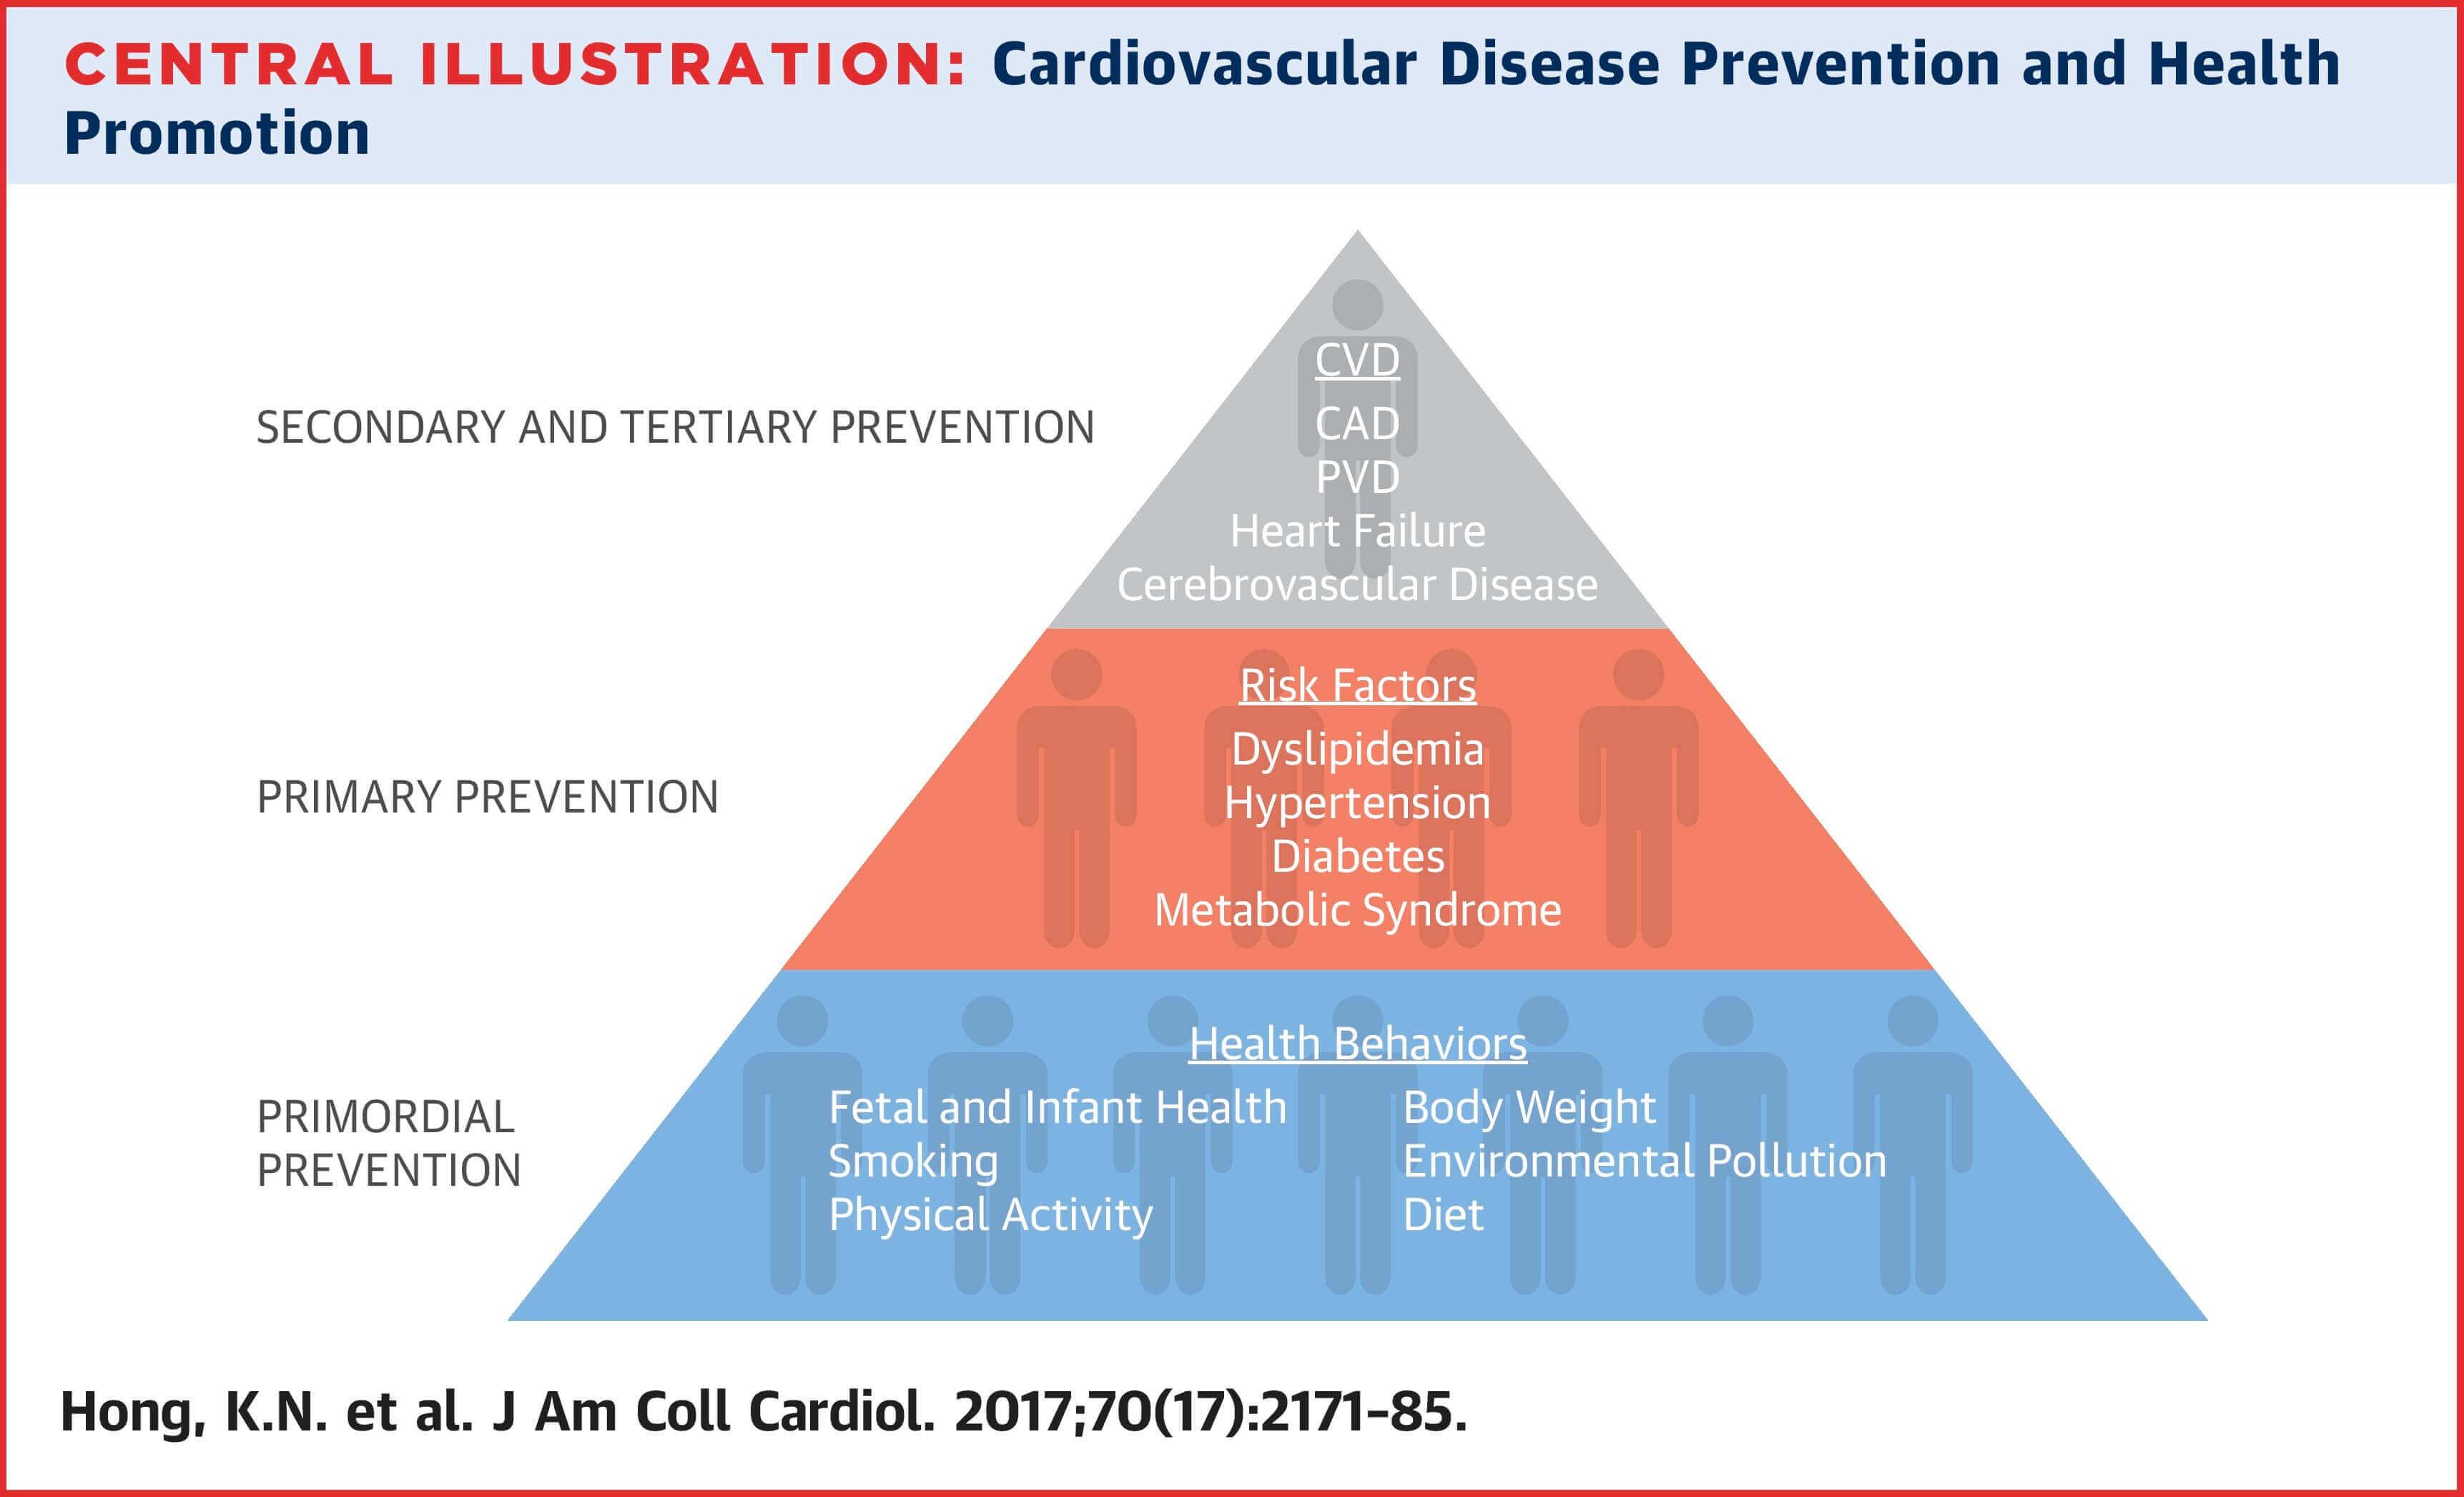 healthifybluepr cvd prevention archives - HD1280×777